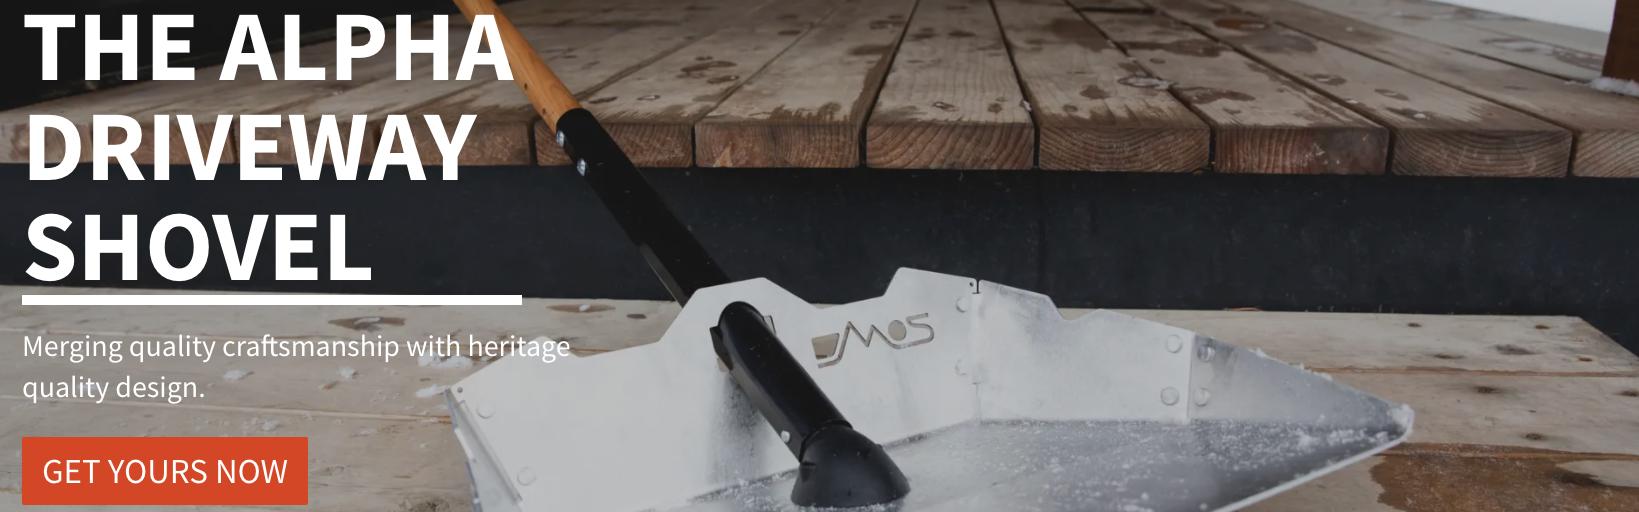 DMOS alpha driveway shovel CTA get yours now